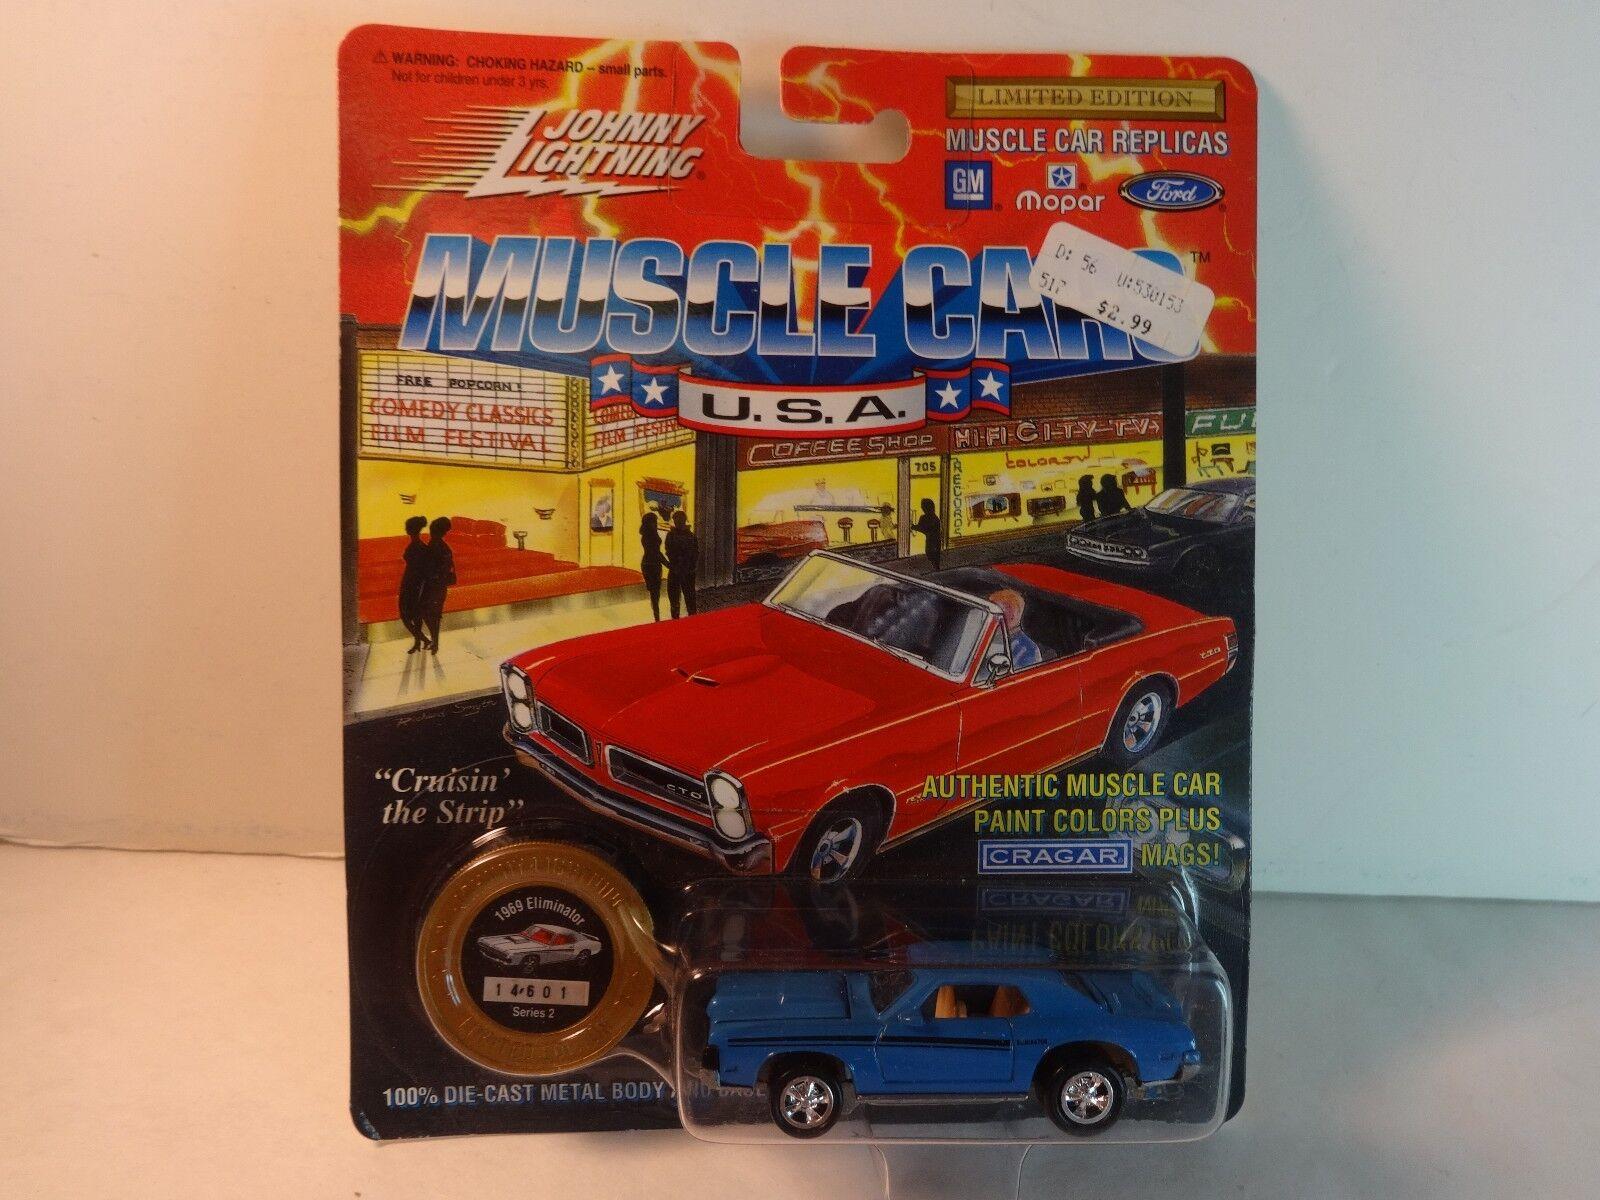 1969 Eliminator Mercury Blur Johnny Lightning Limited Edition 1 64th ...